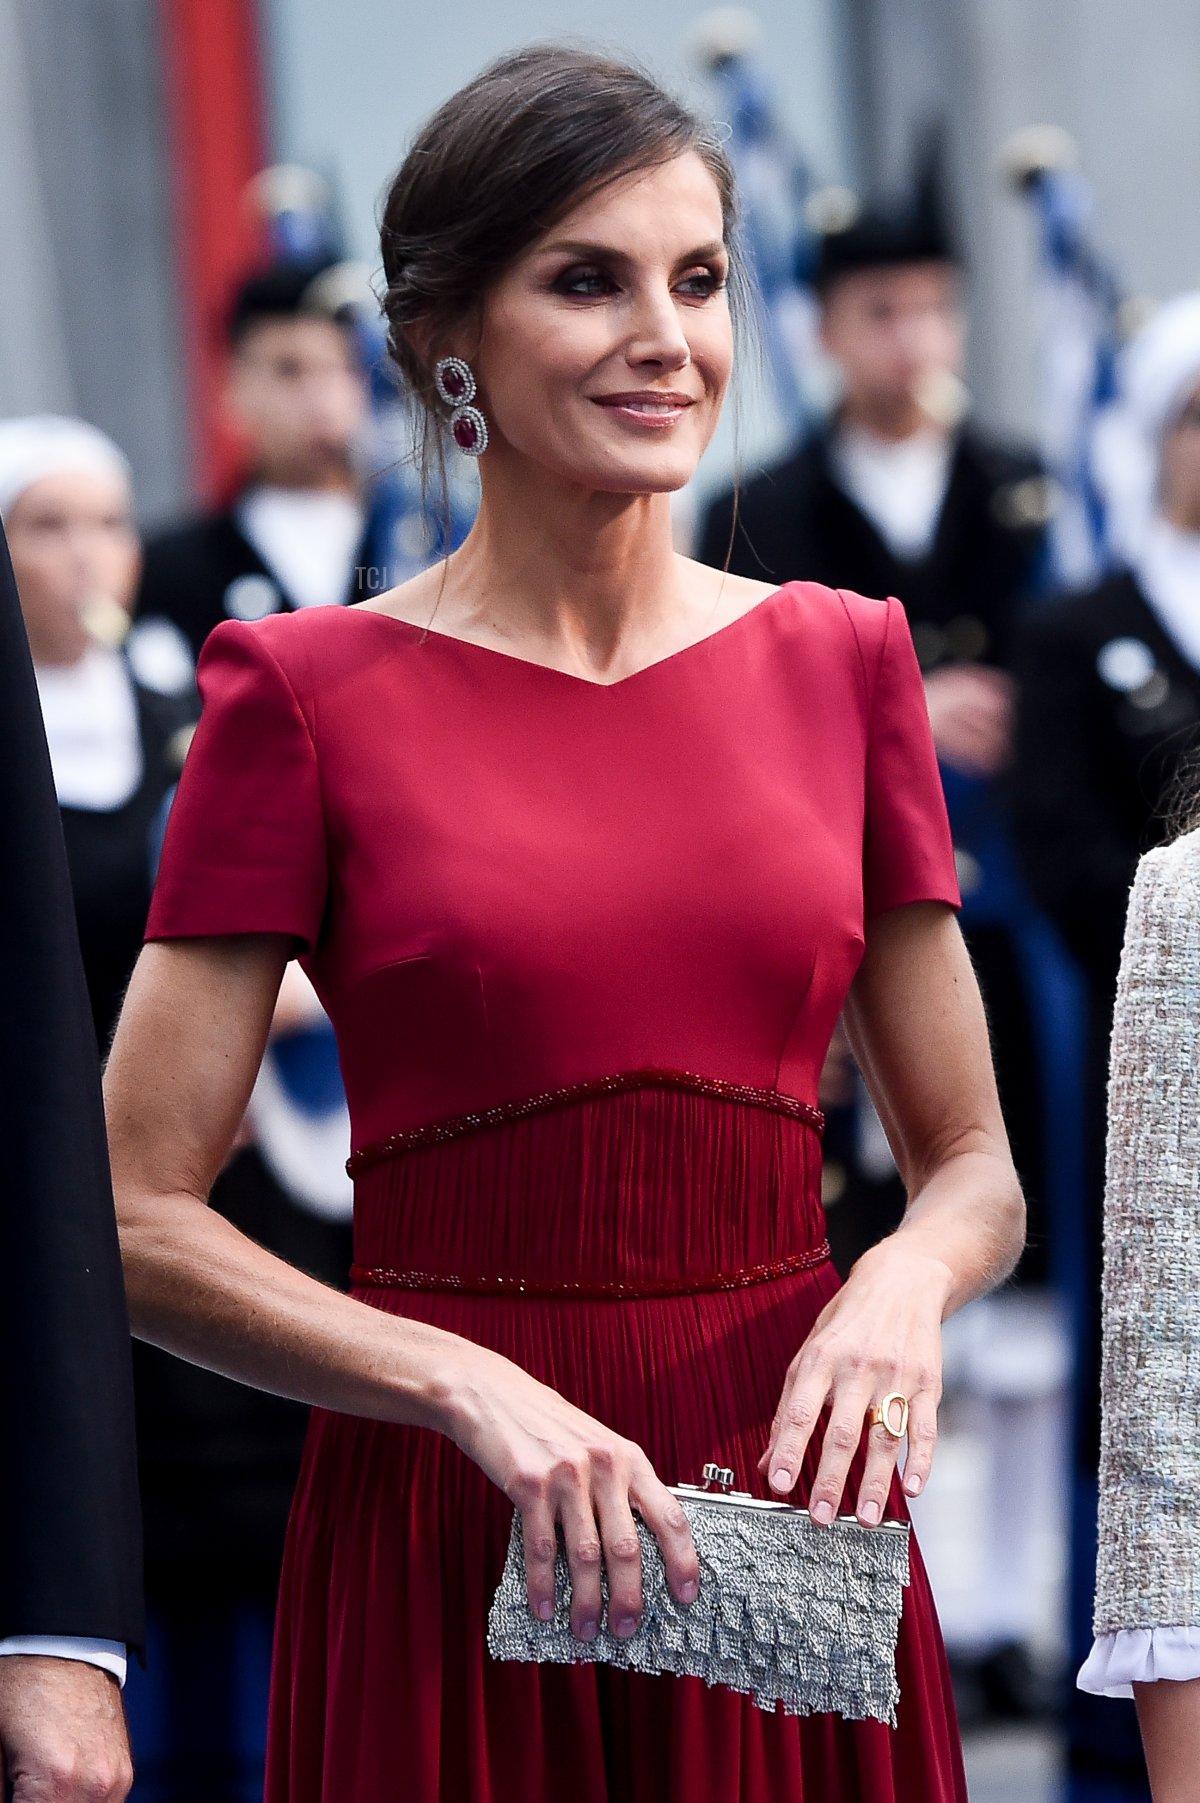 Queen Letizia of Spain arrives to the Campoamor Theatre ahead of the 'Princesa de Asturias' Awards Ceremony 2019 on October 18, 2019 in Oviedo, Spain